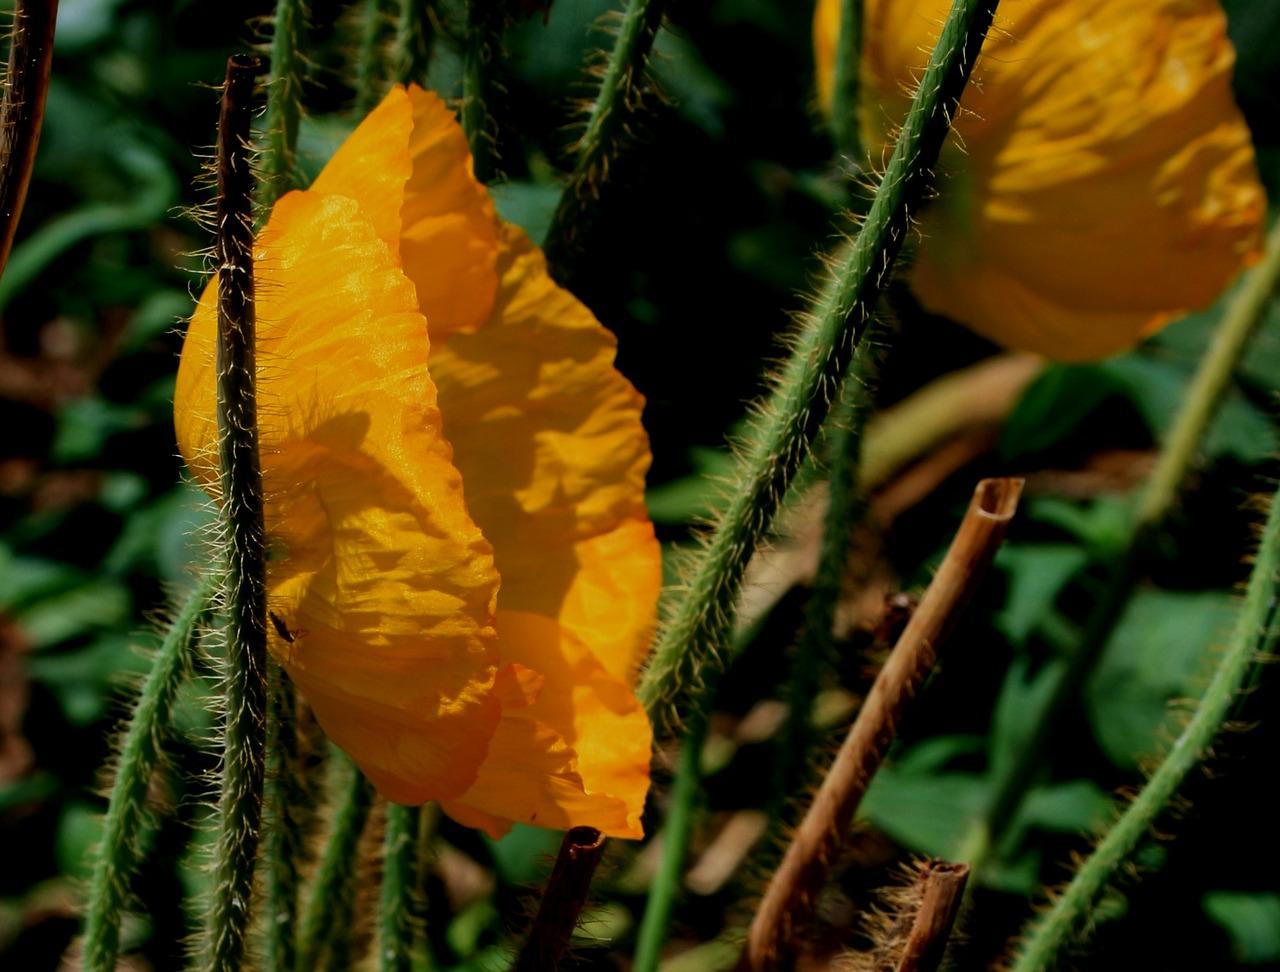 Flowerpoppybloompetalspaper Like Free Photo From Needpix